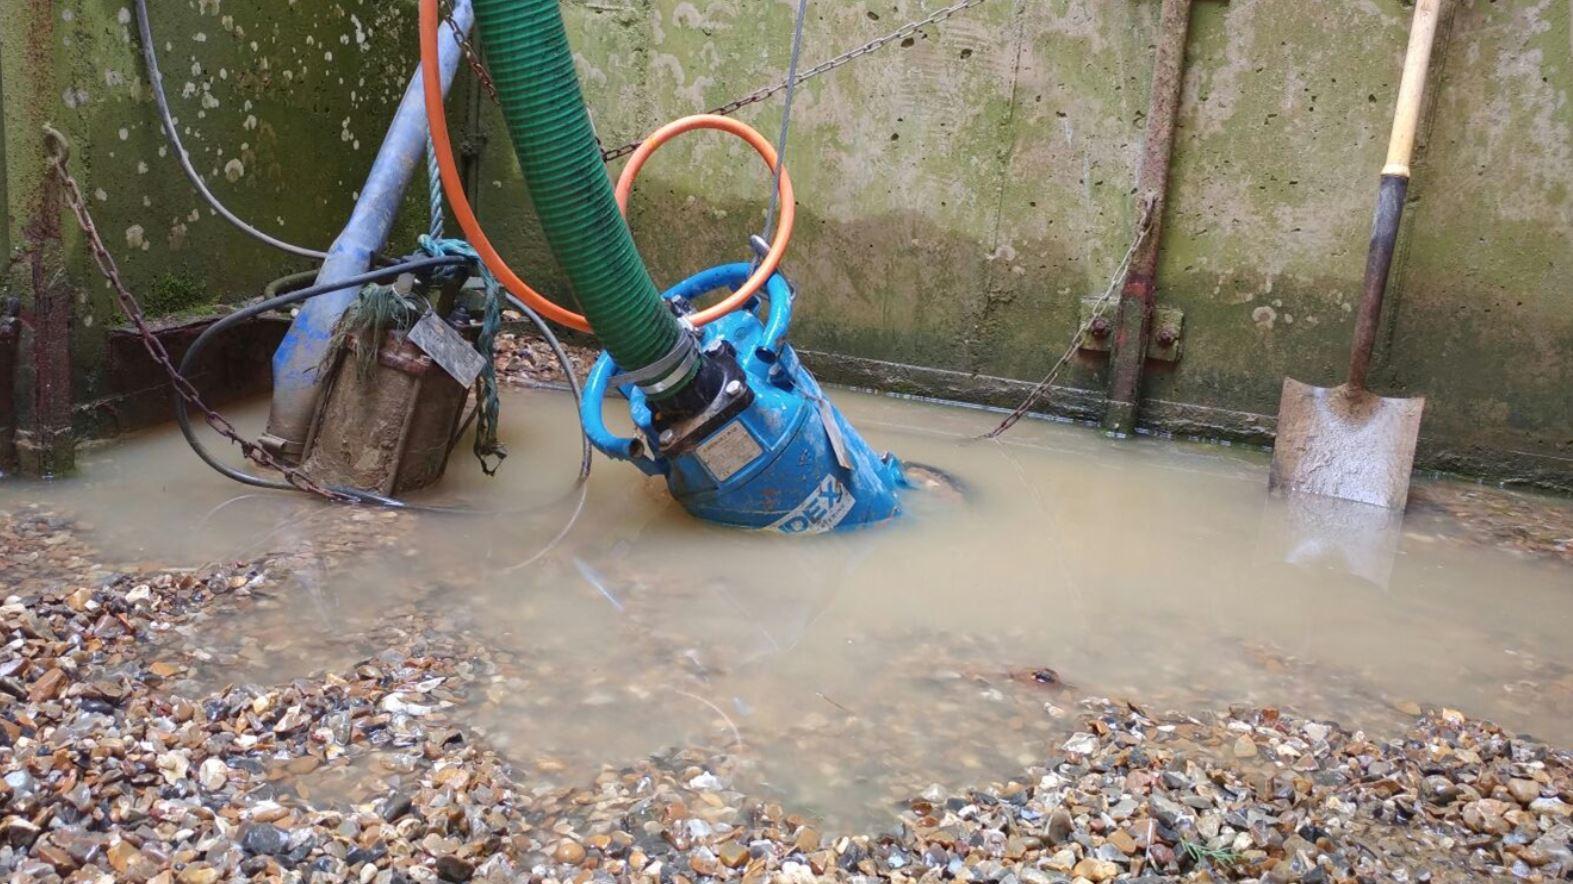 Audex pump